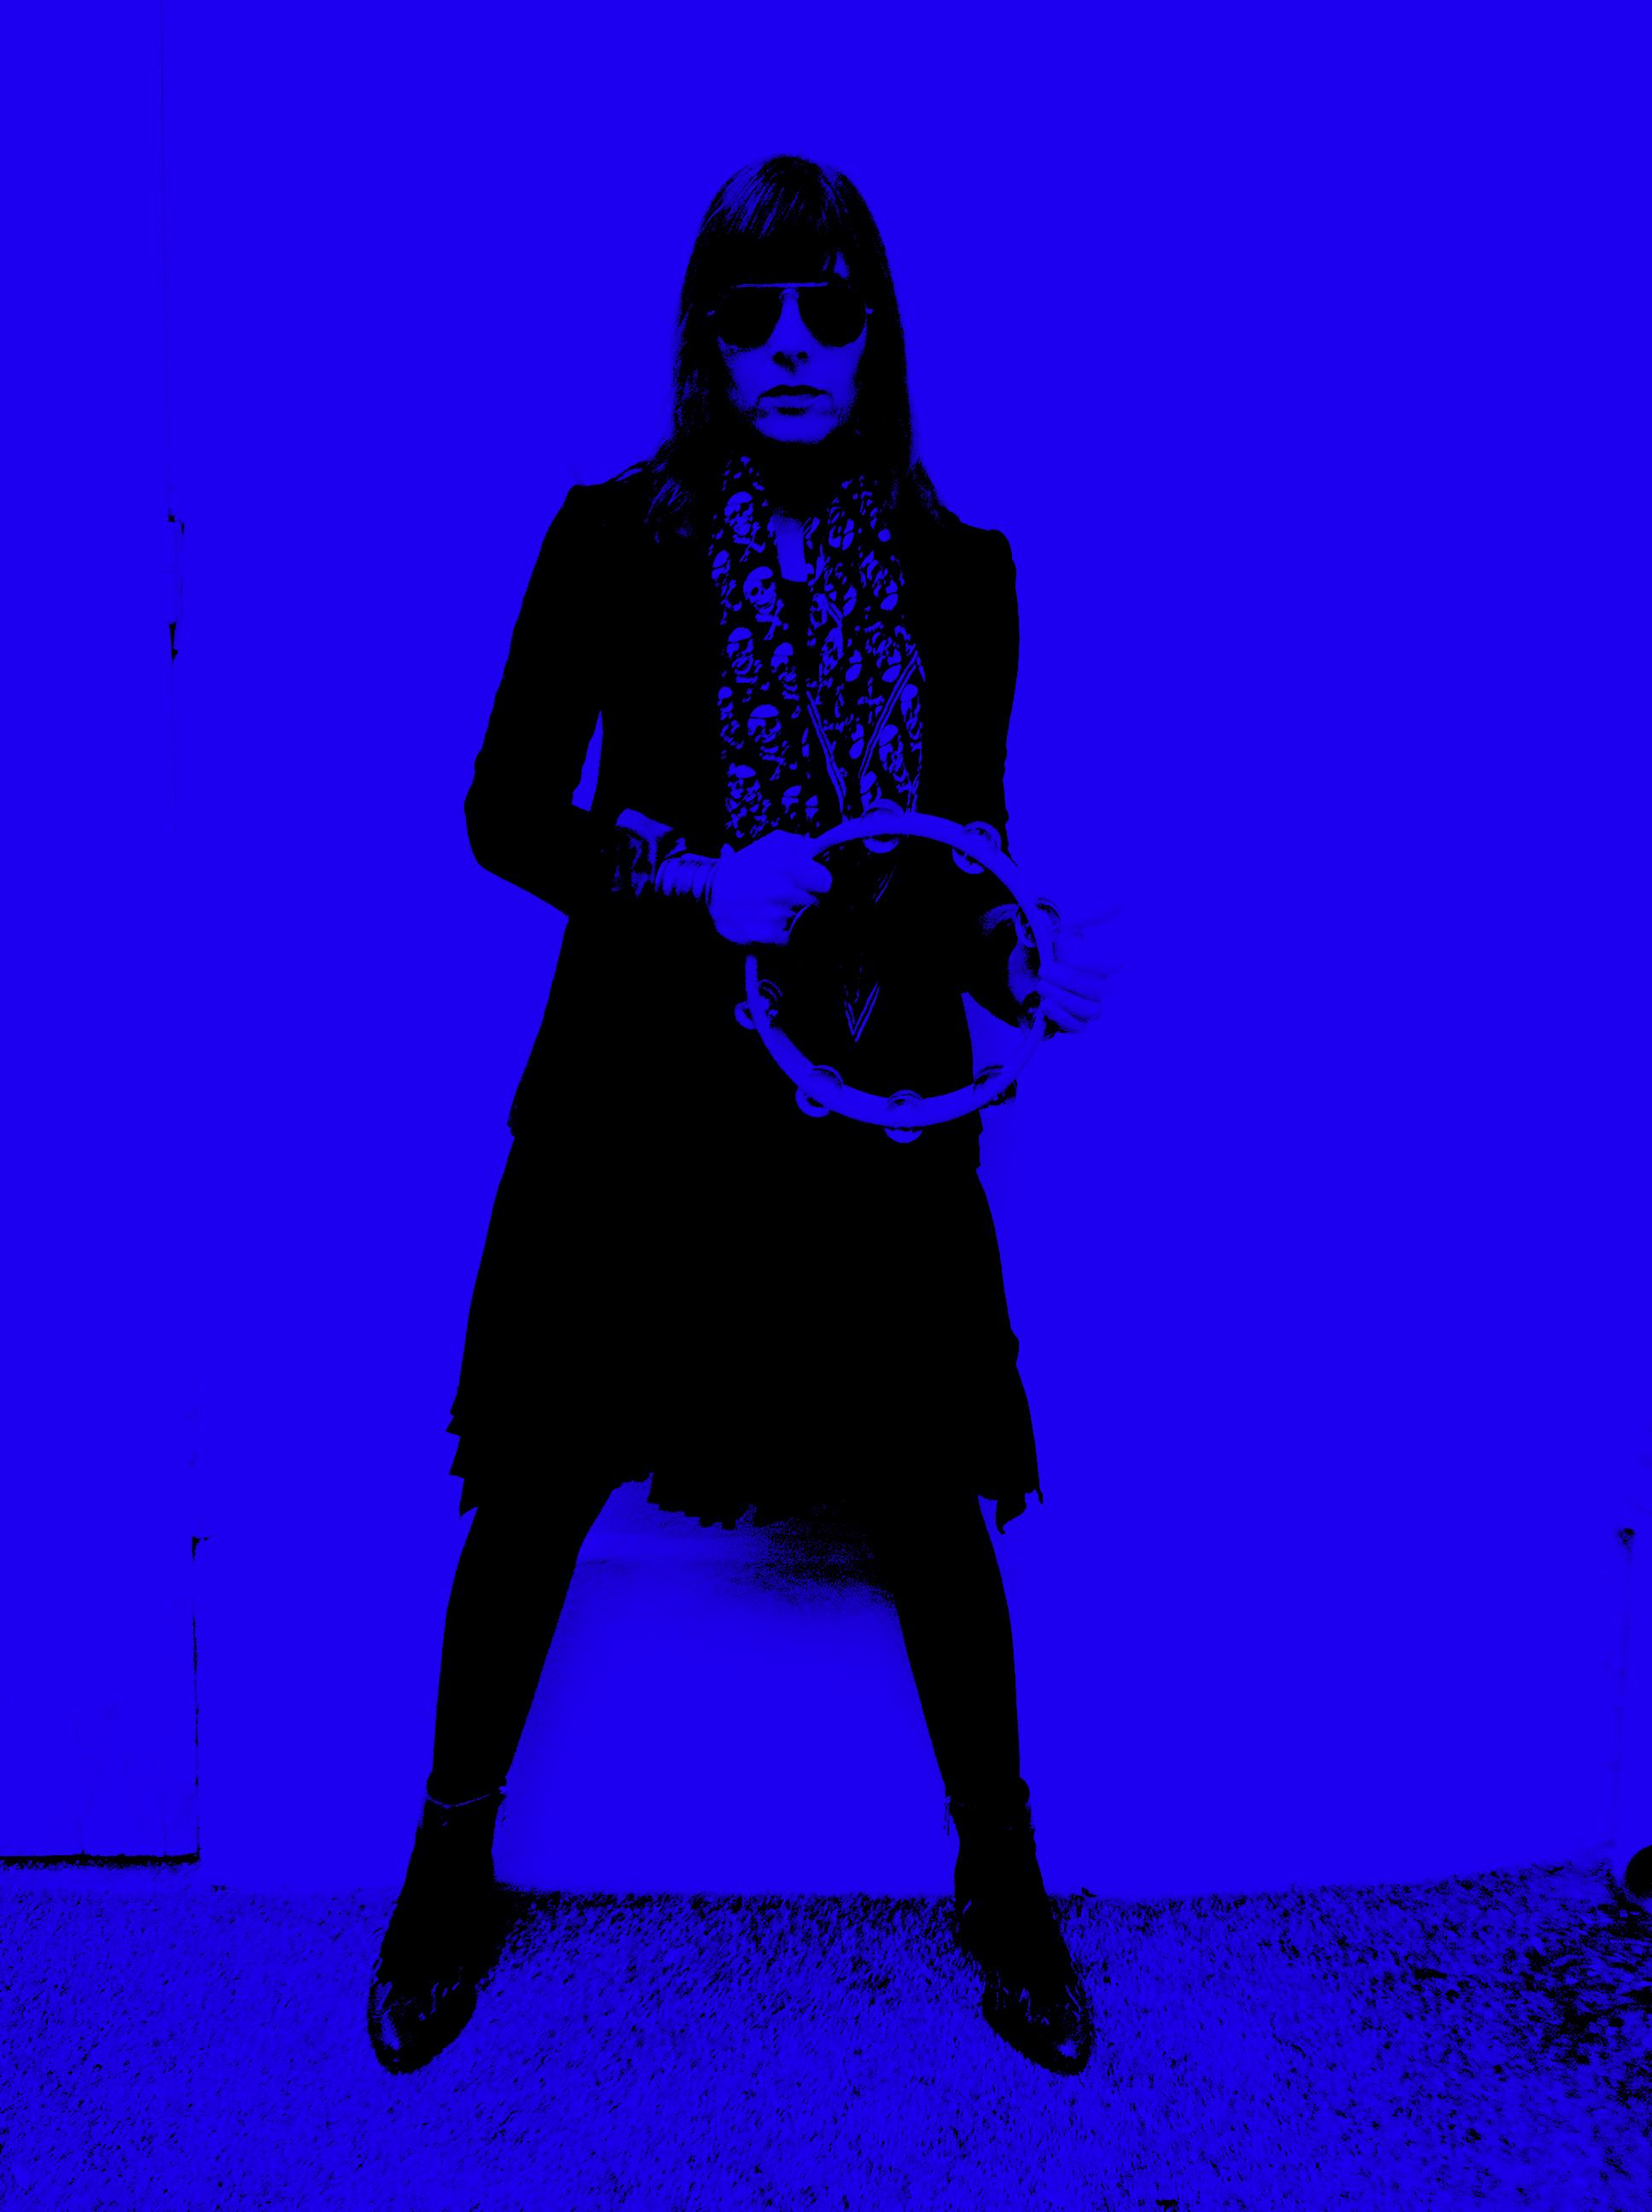 Angela_Rock_Paris_Blue-1464647493.jpg